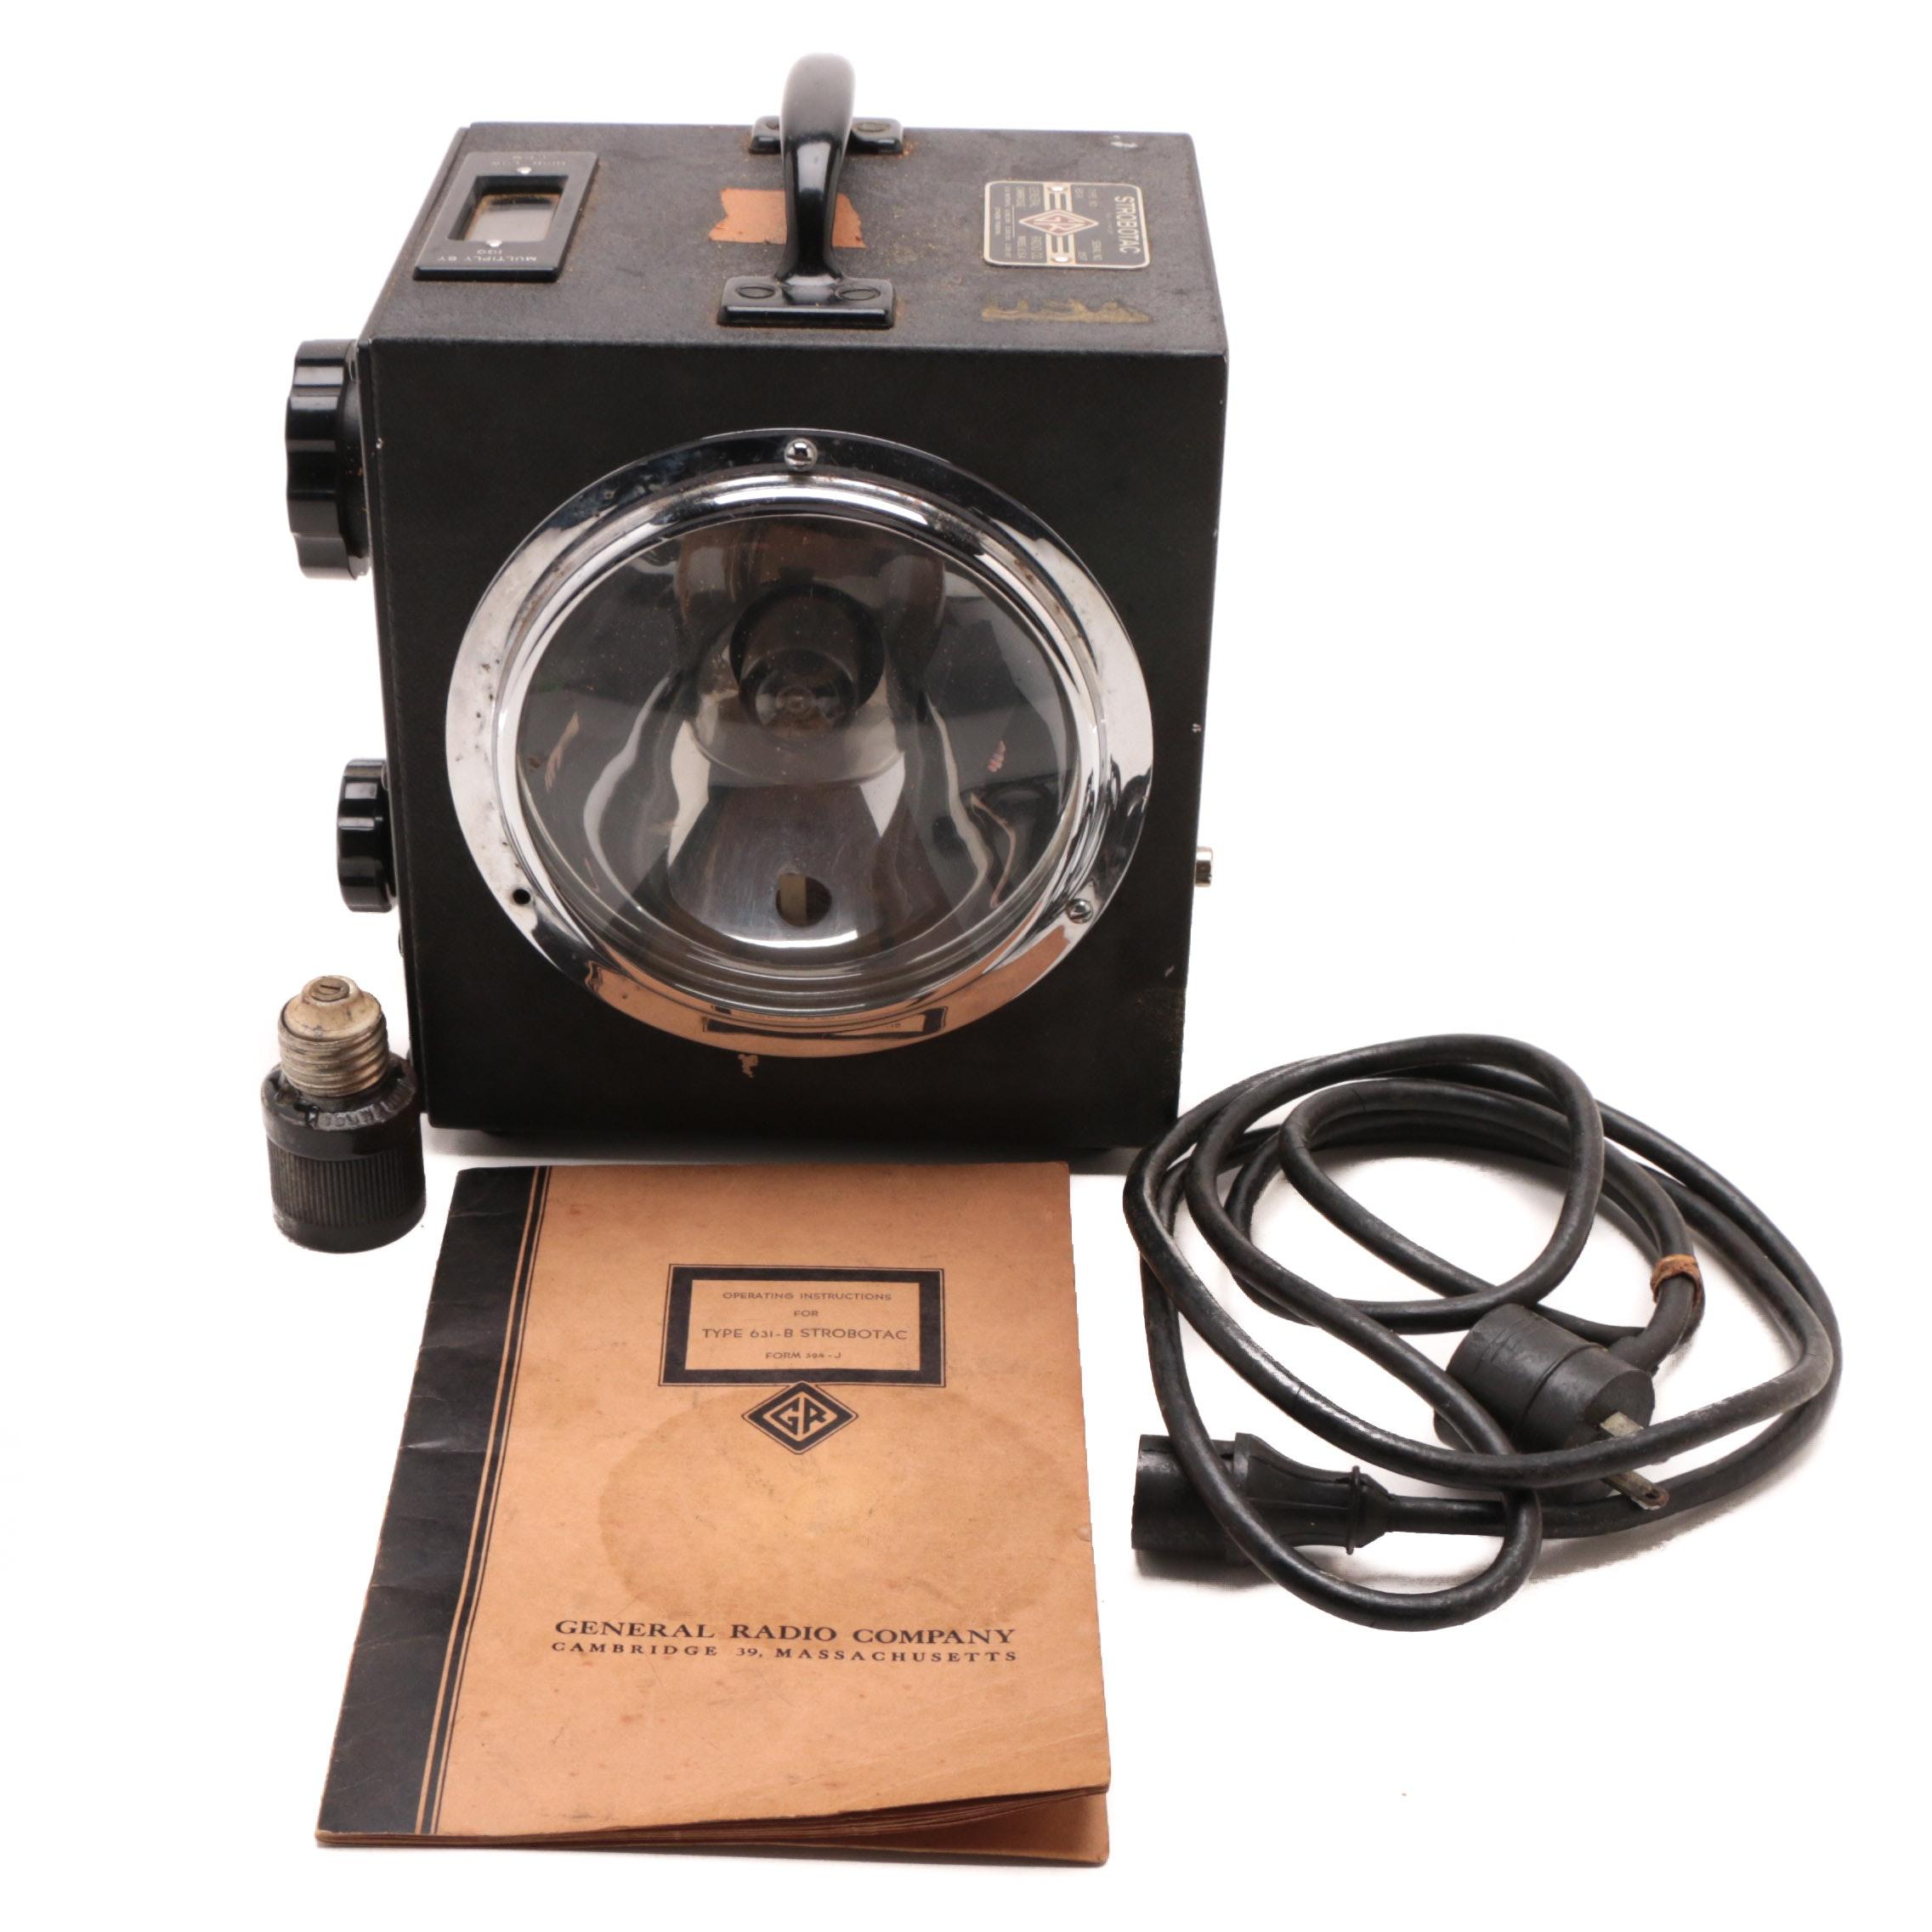 Circa 1940 Strobotac 631-B Stroboscopic Tachometer